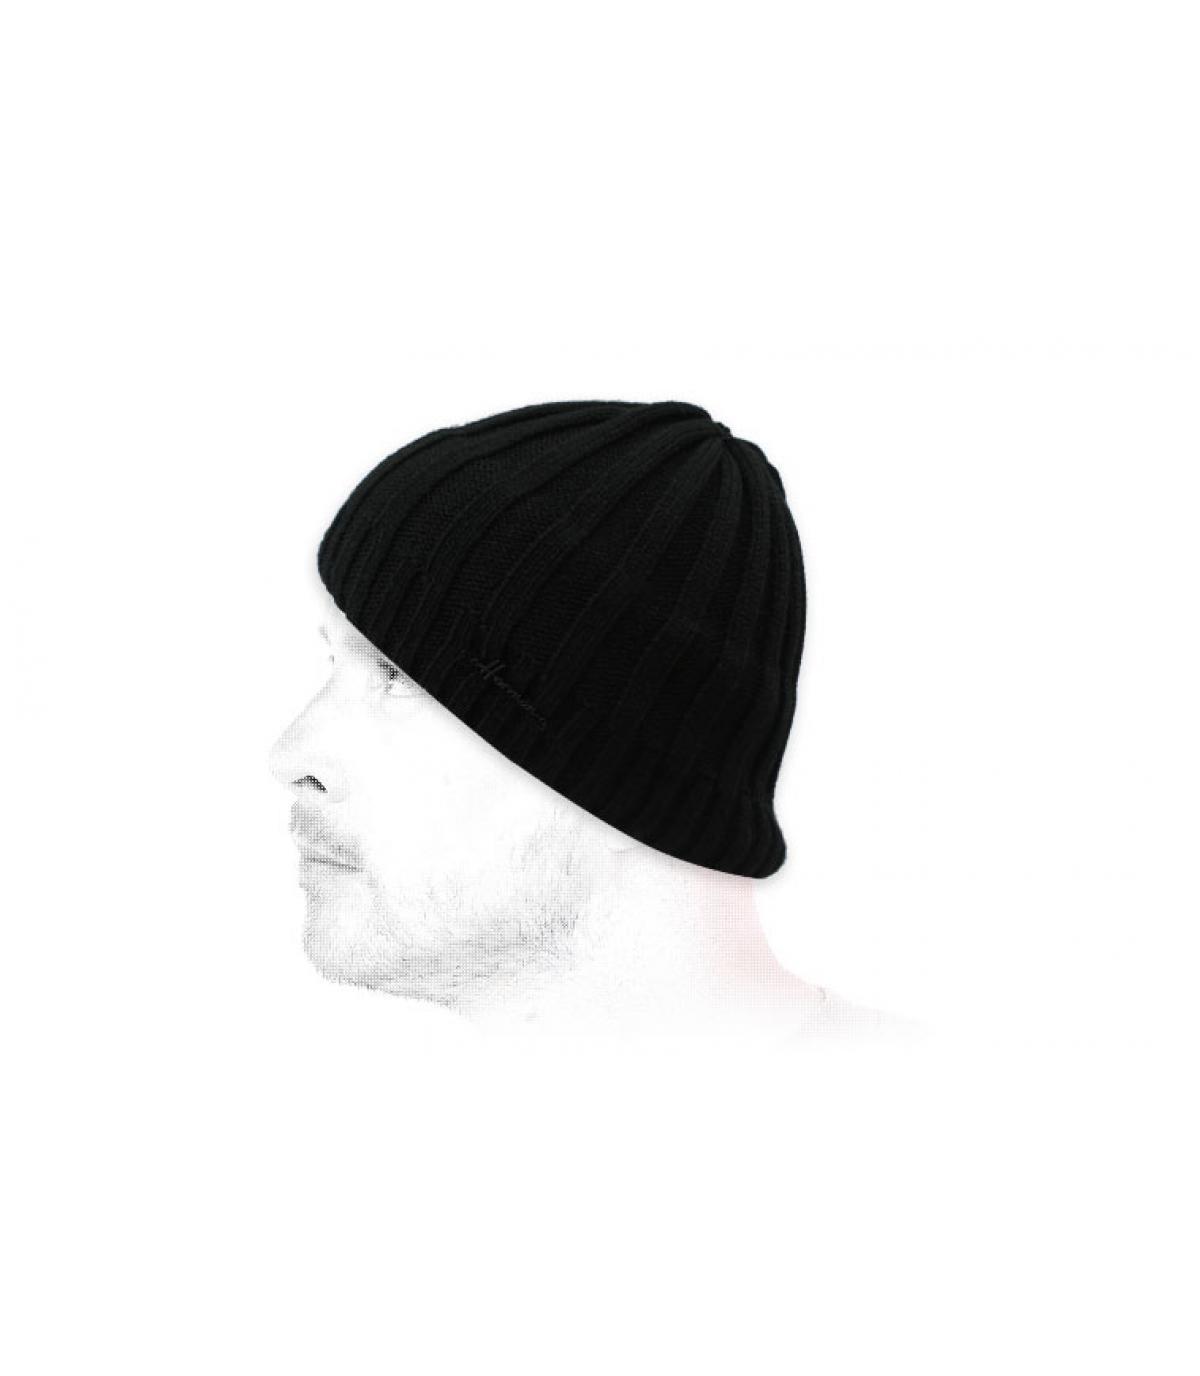 zwarte korte hoed